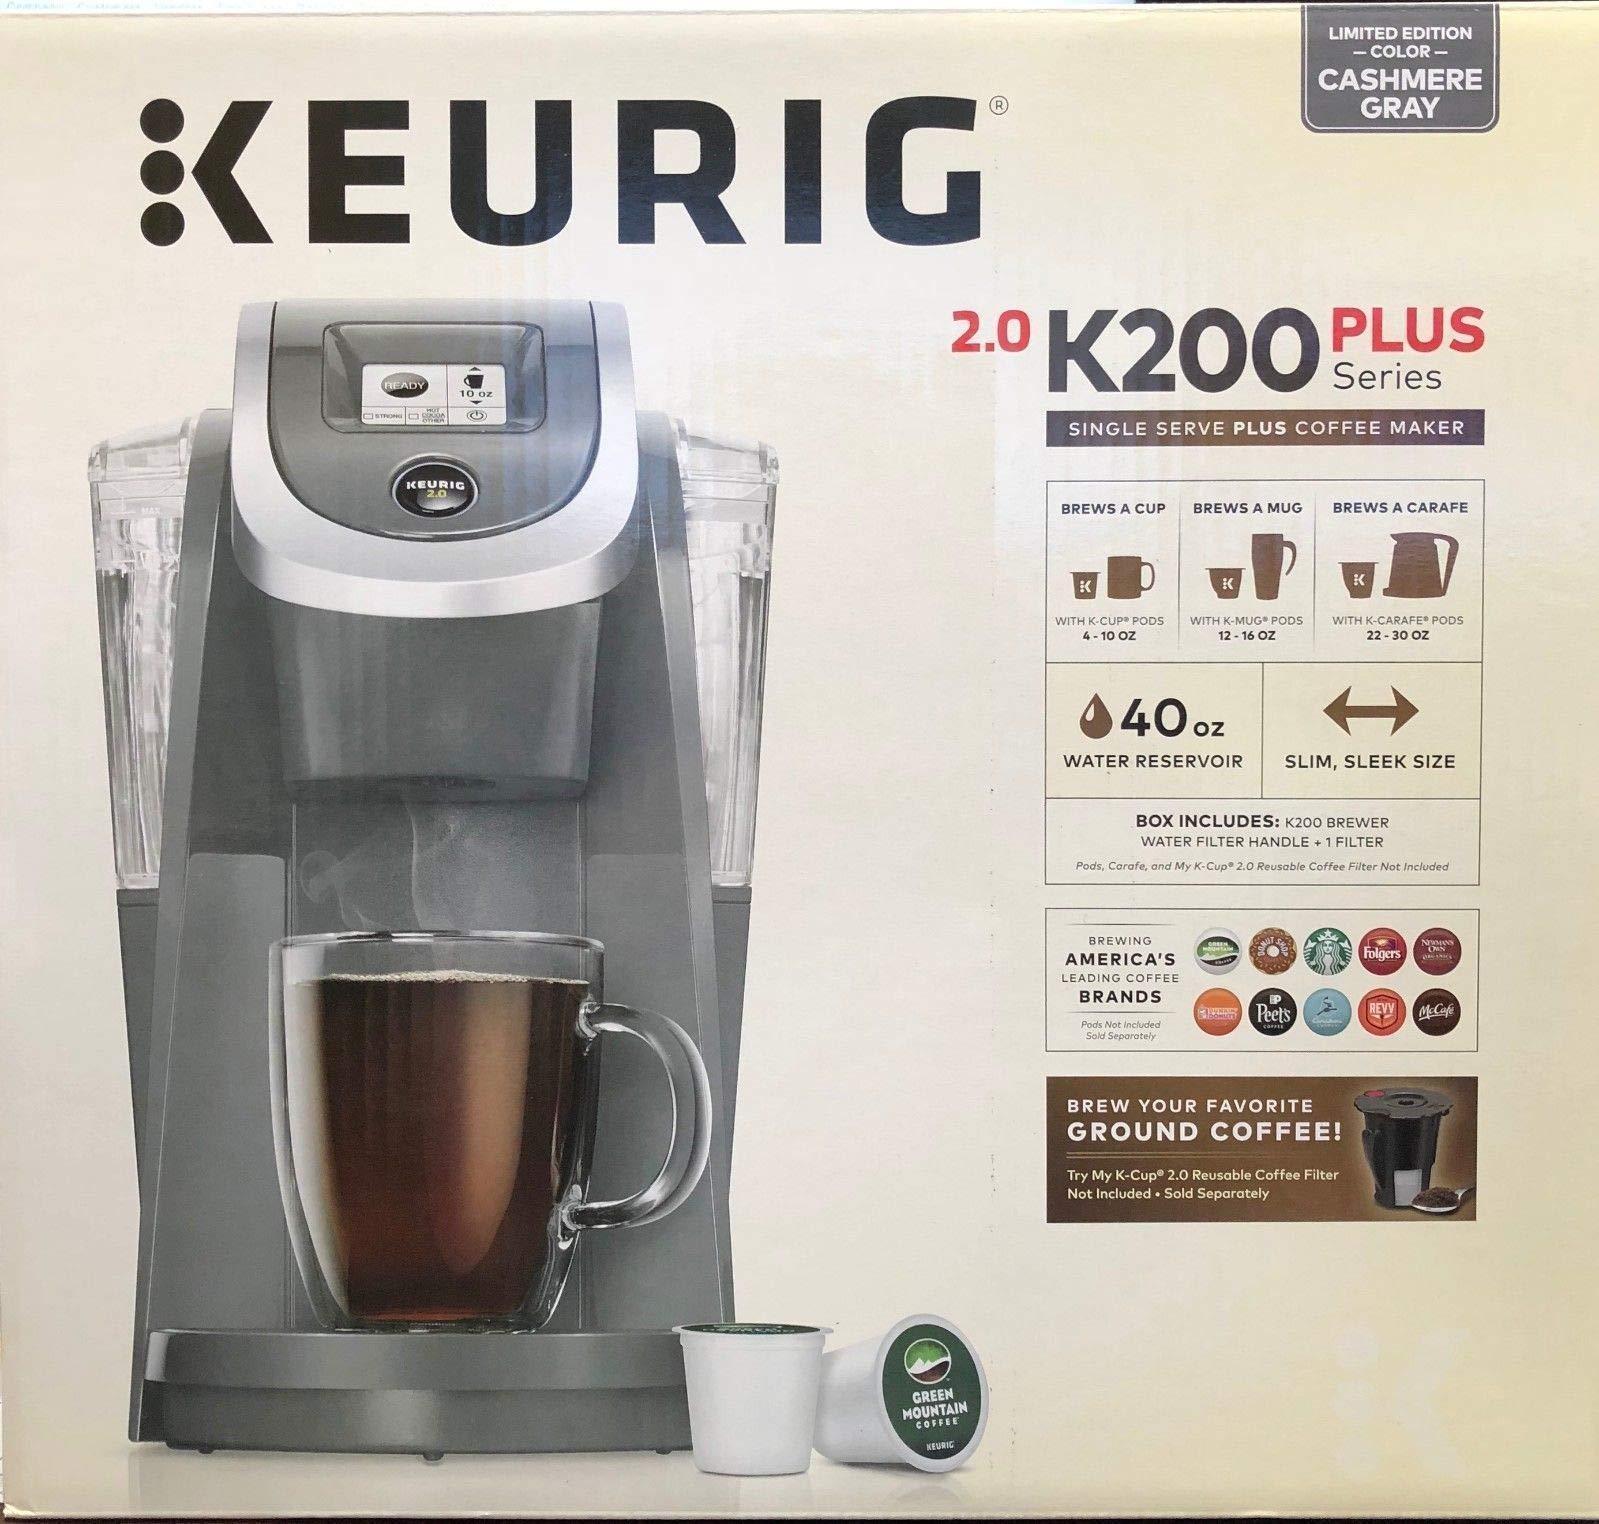 Keurig K200 Single Serve K-Cup Pod Coffee Maker - - Cashmere Gray - Limited Edition by Keurig